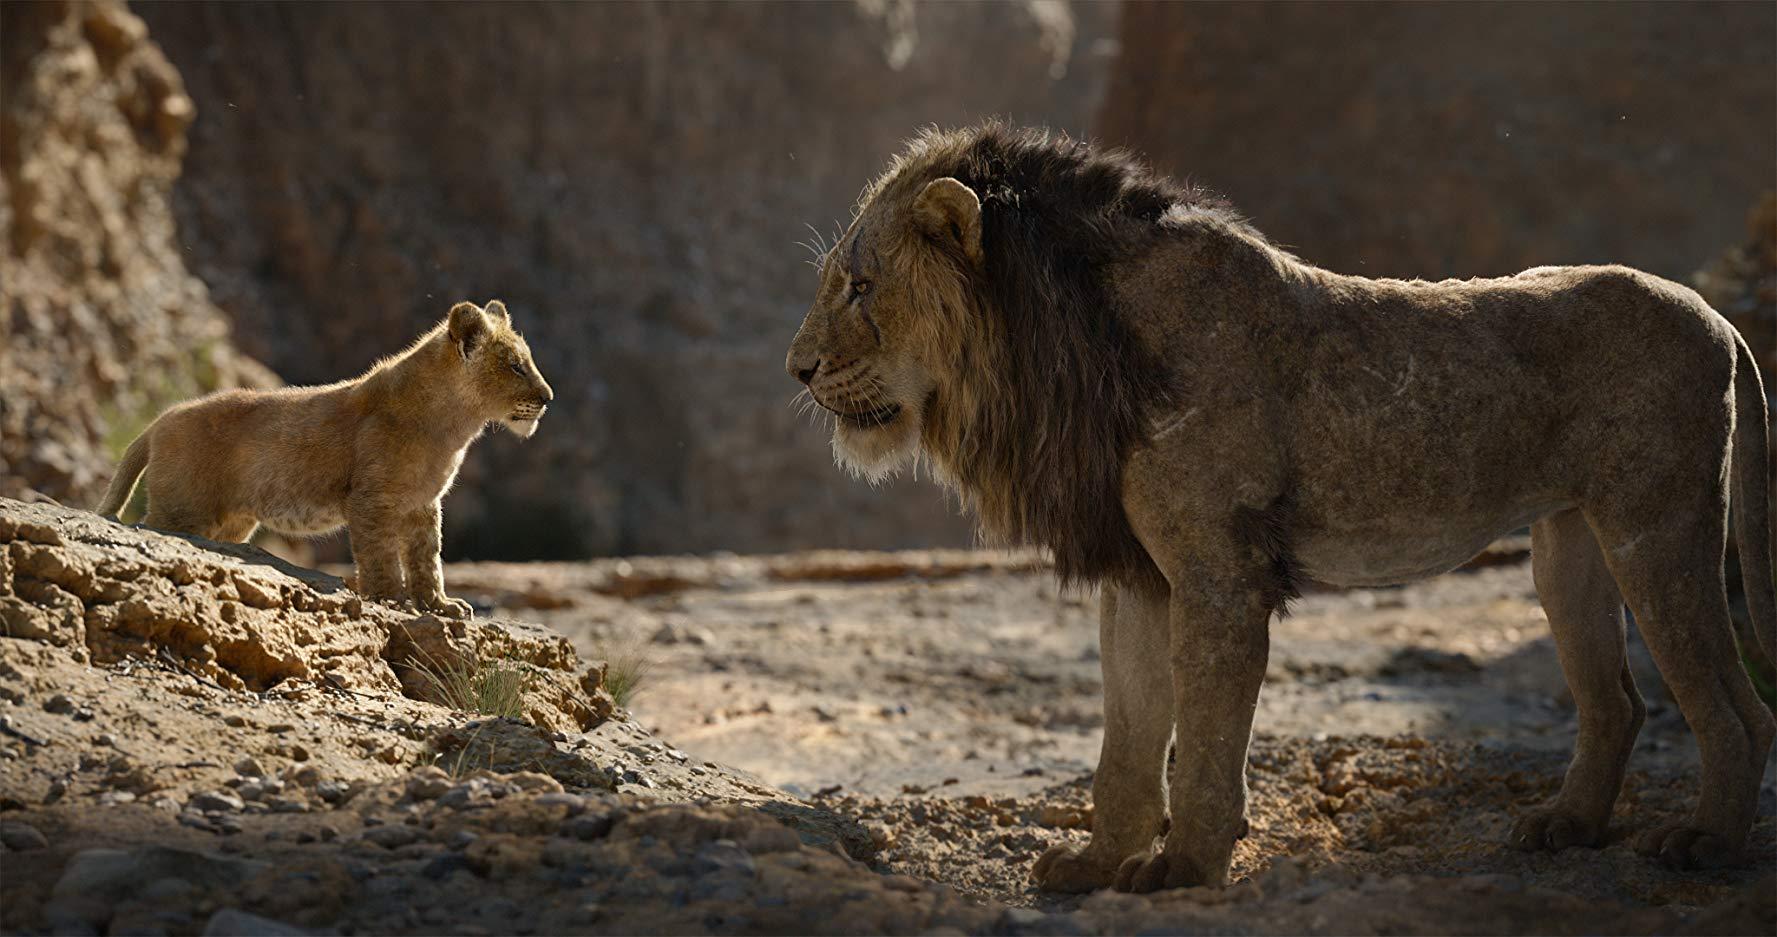 the lion king - 1.jpg